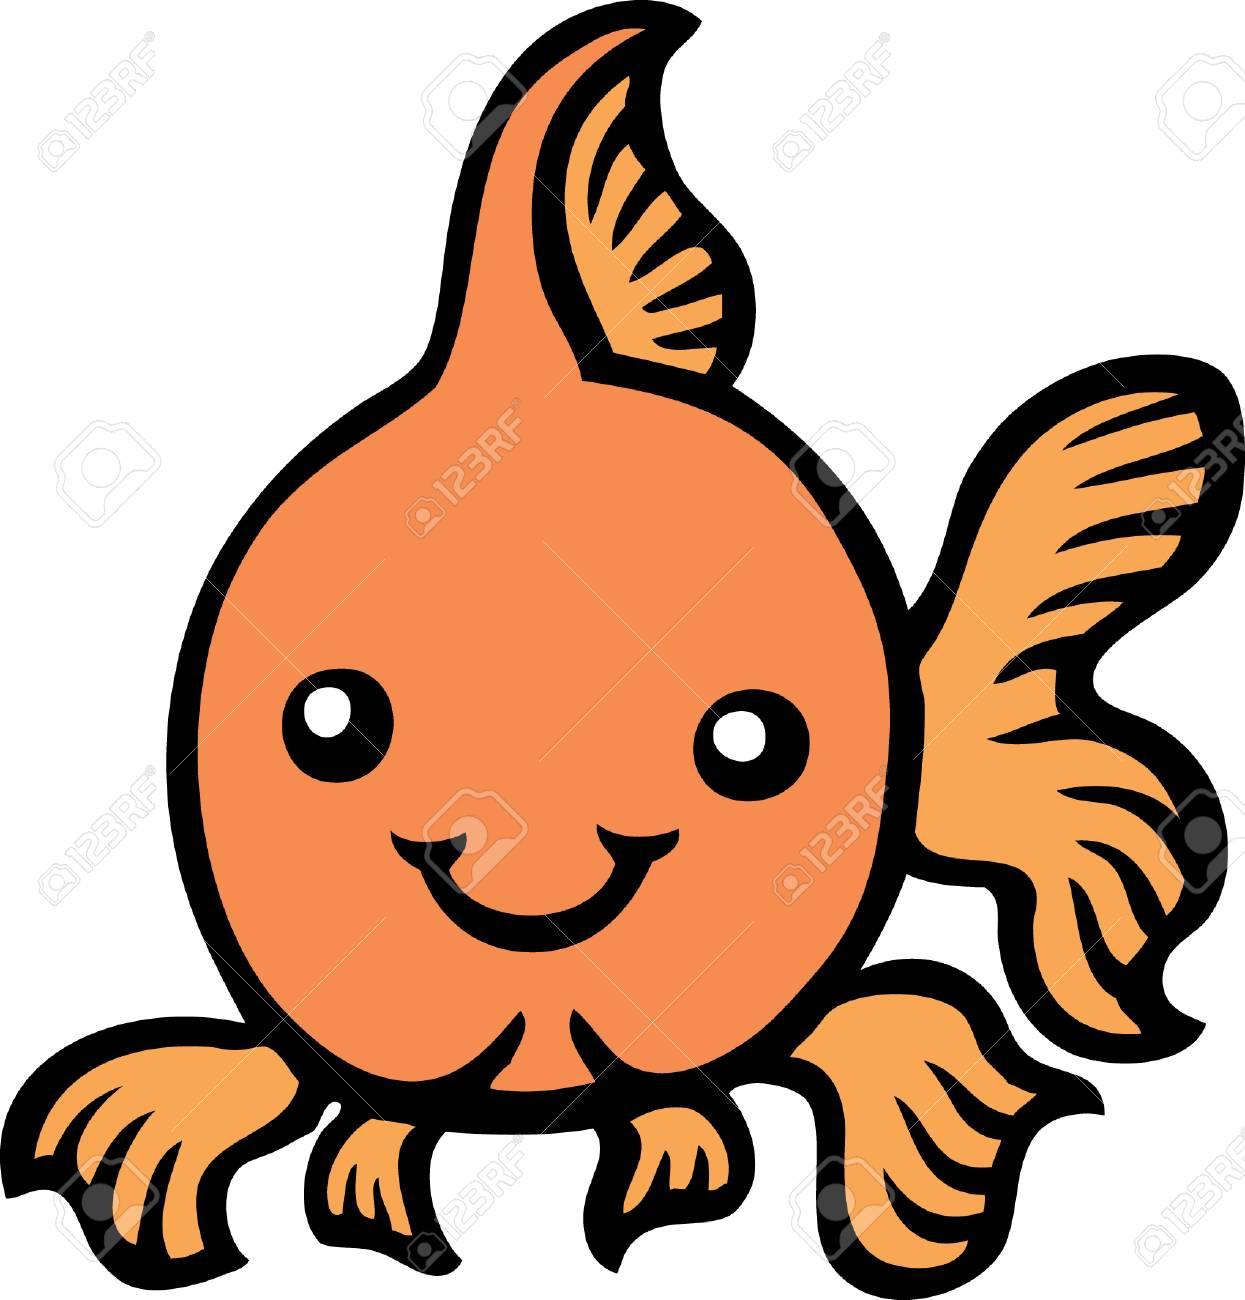 Goldfish Stock Vector - 23511644